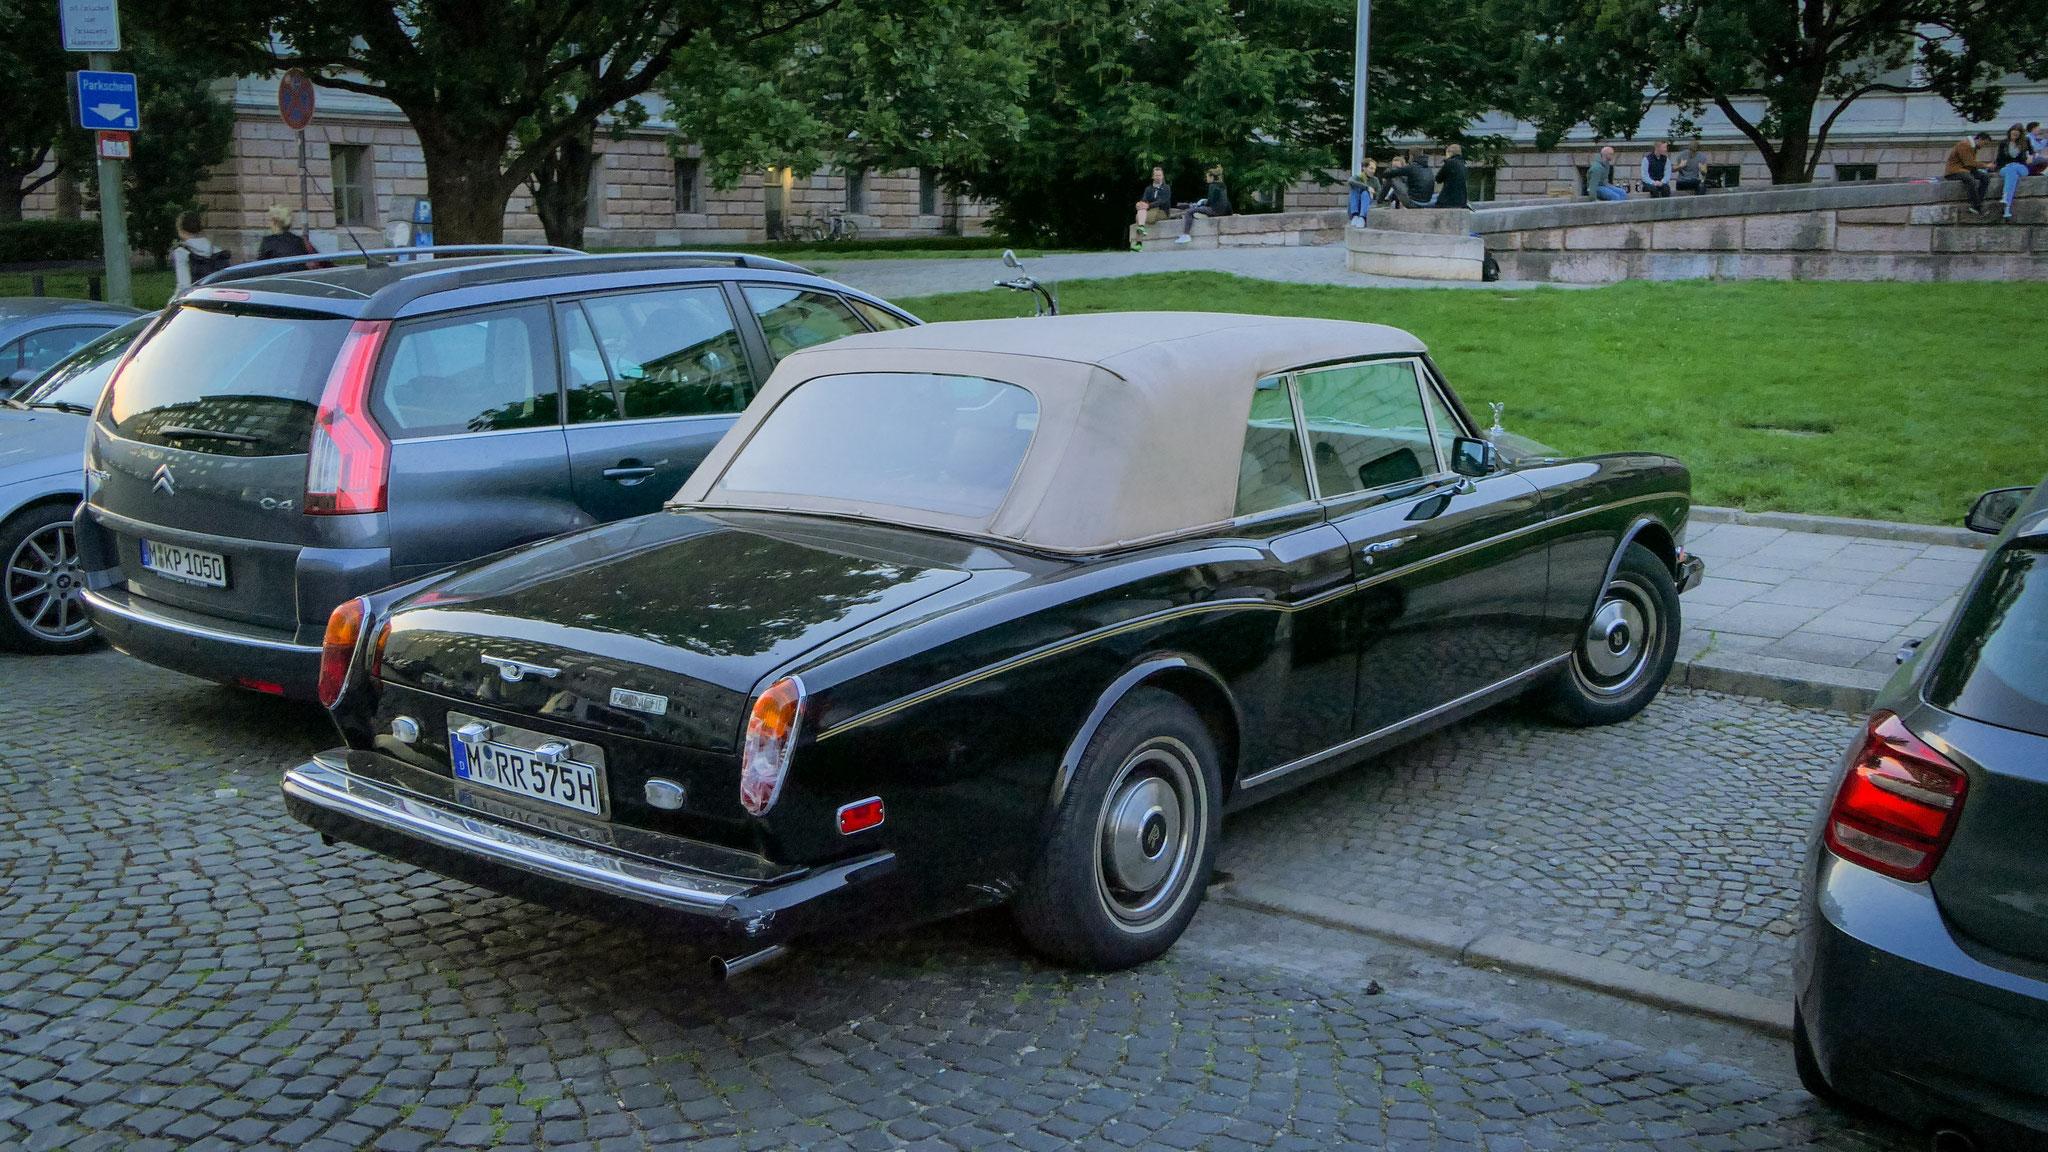 Bentley Corniche - M-RR-575H